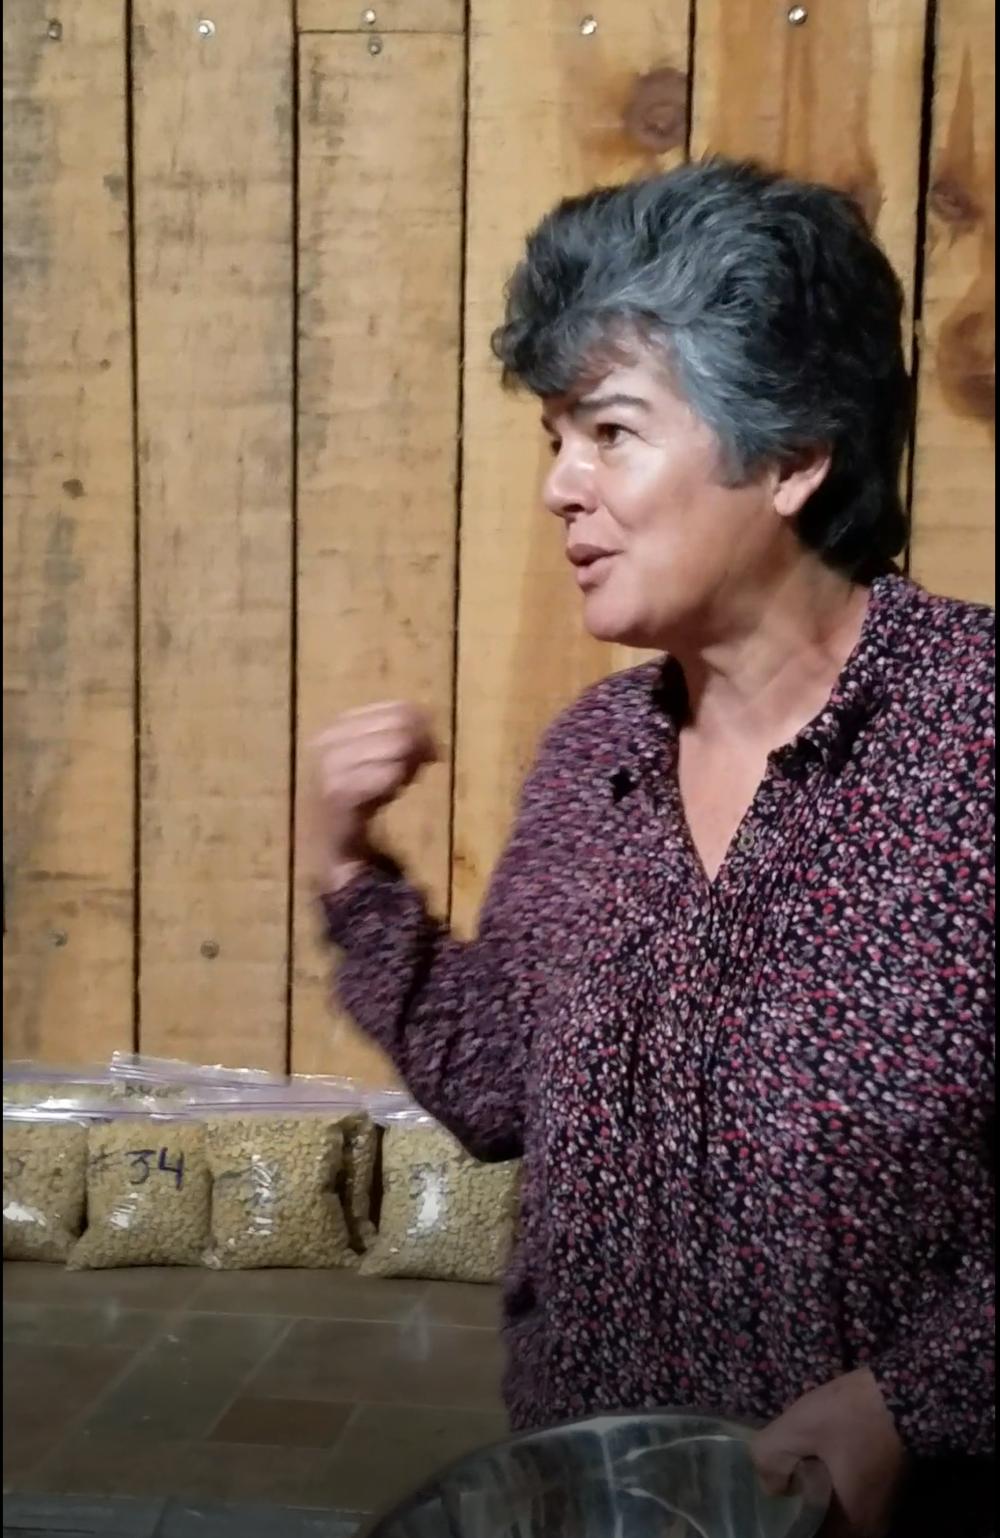 Dona Maria Elena of Finca Salaca